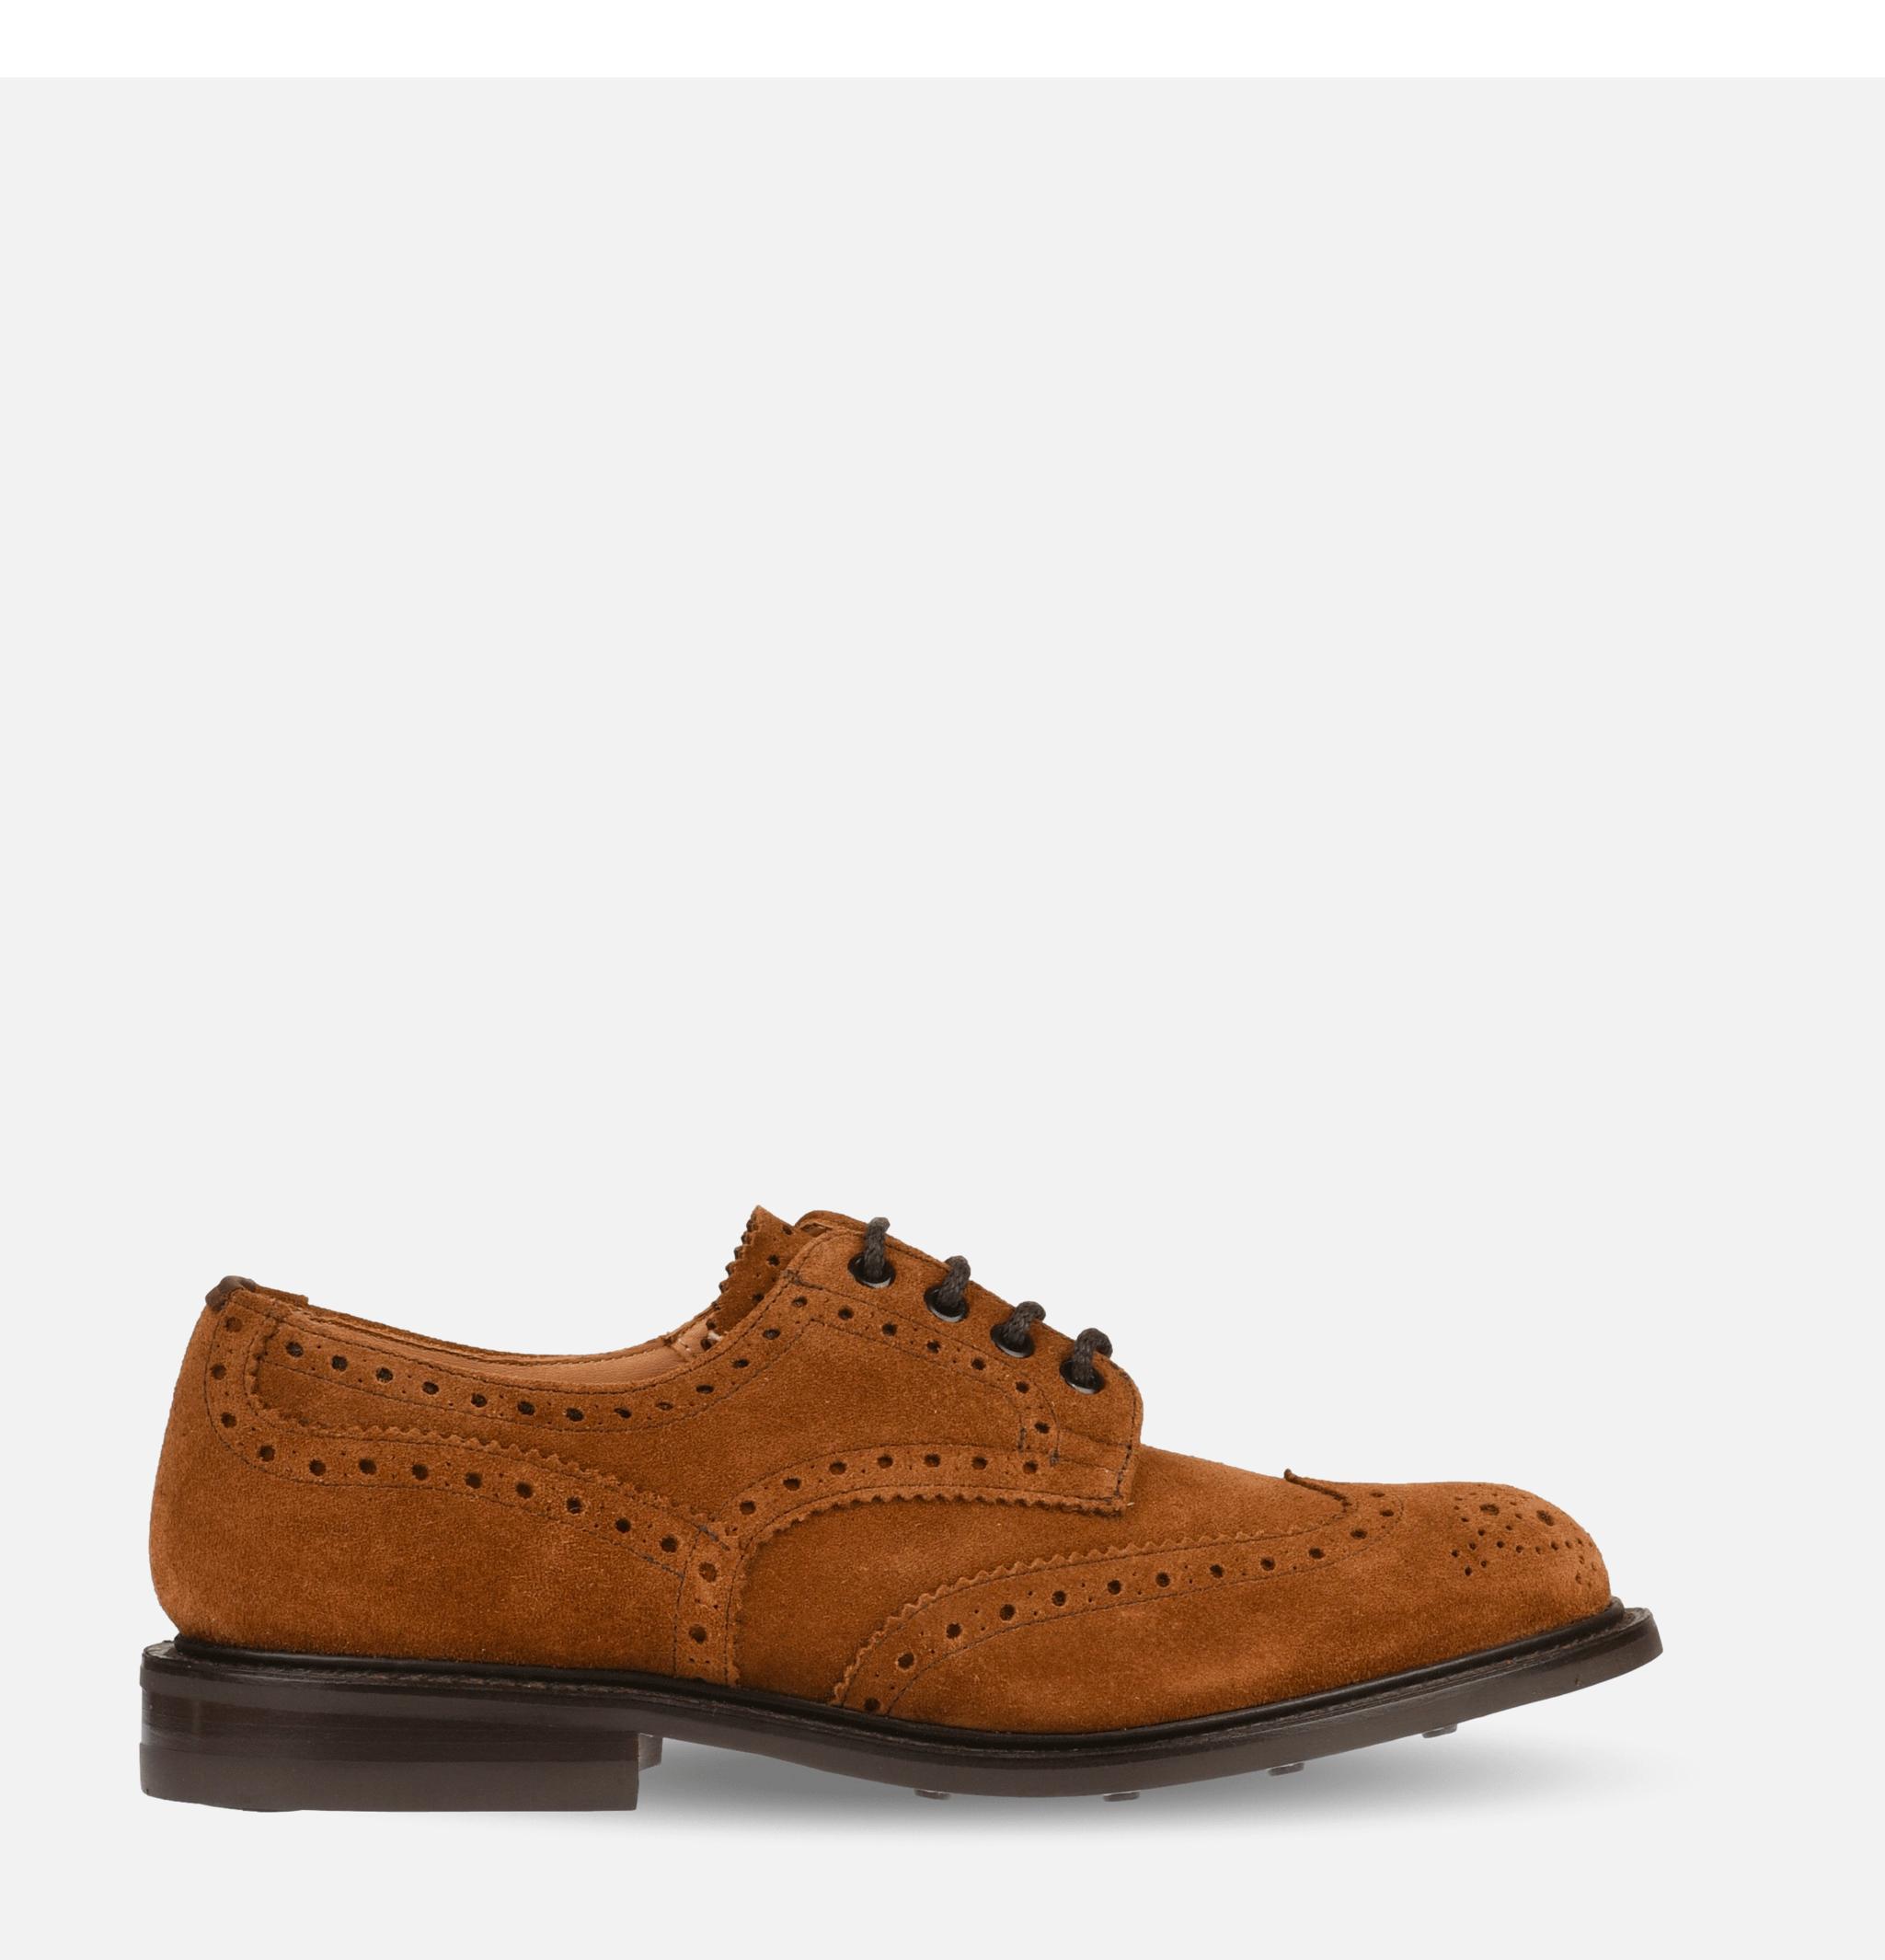 Chaussures Bourton Snuff Suede